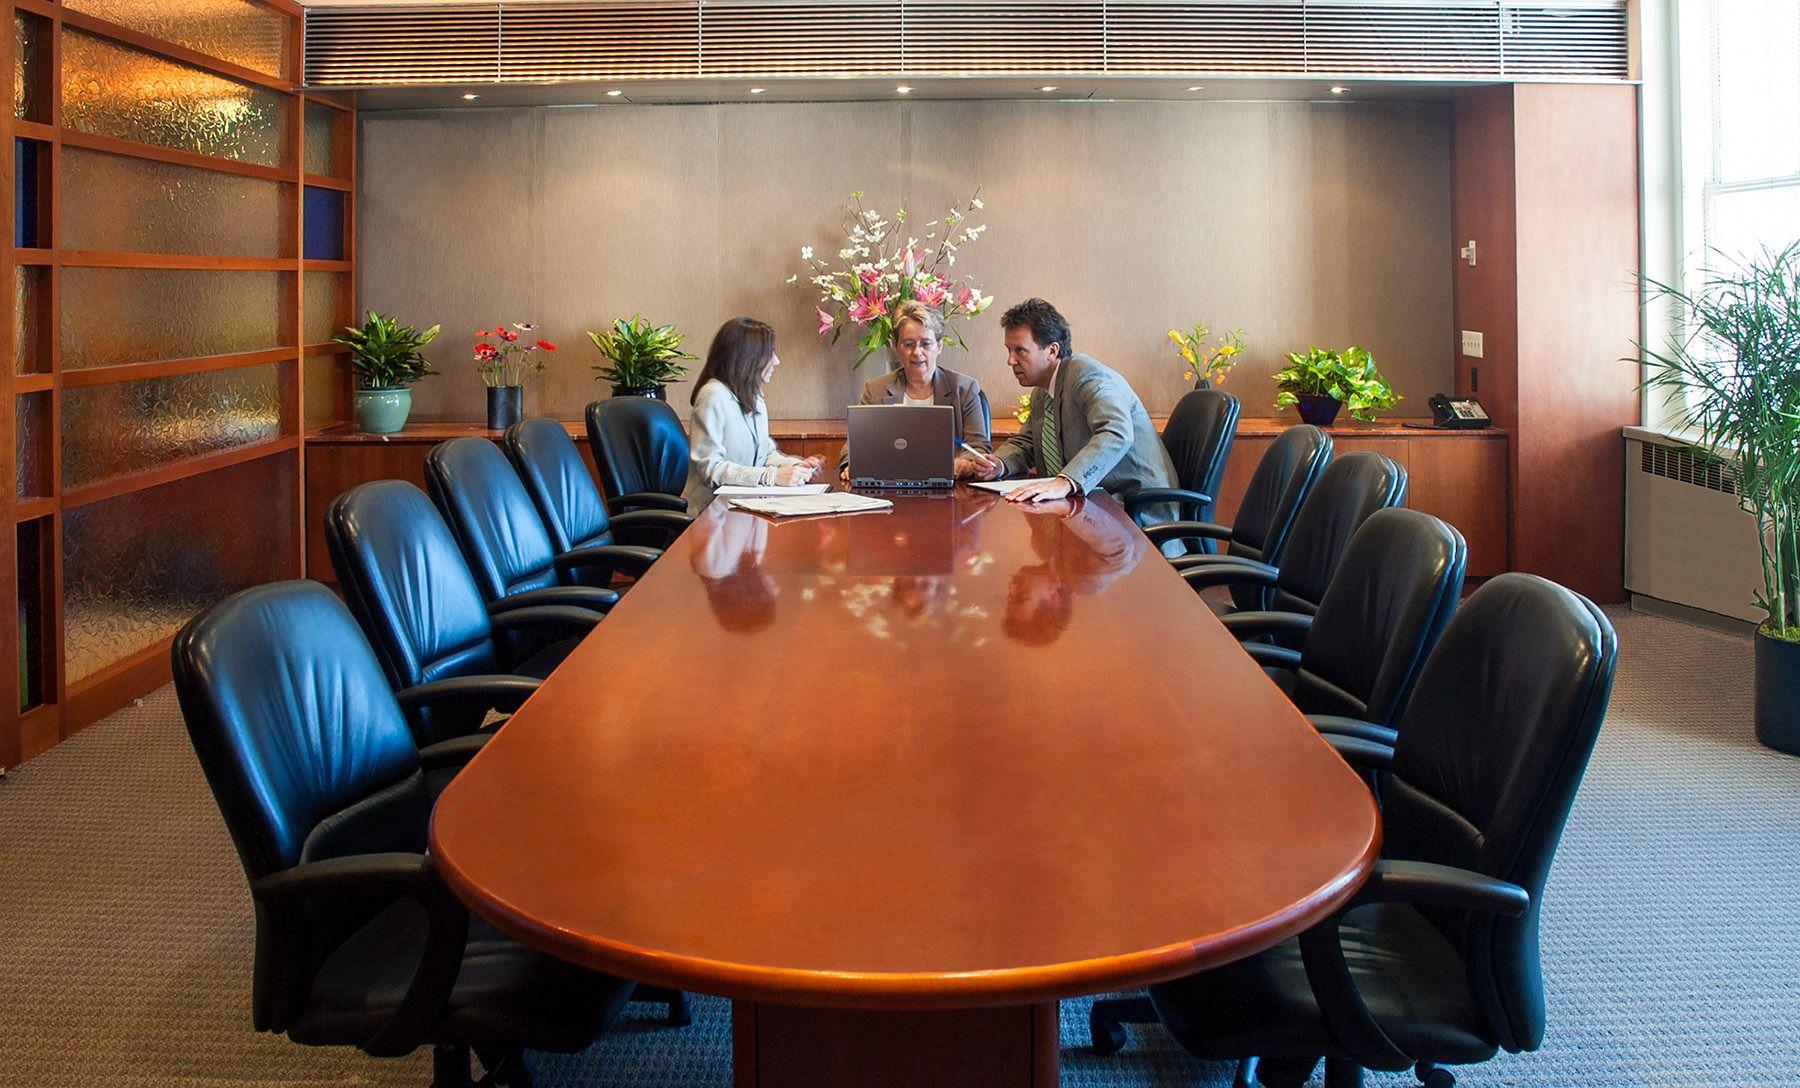 Conference Room, 45 Rockefeller Center, New York, NY